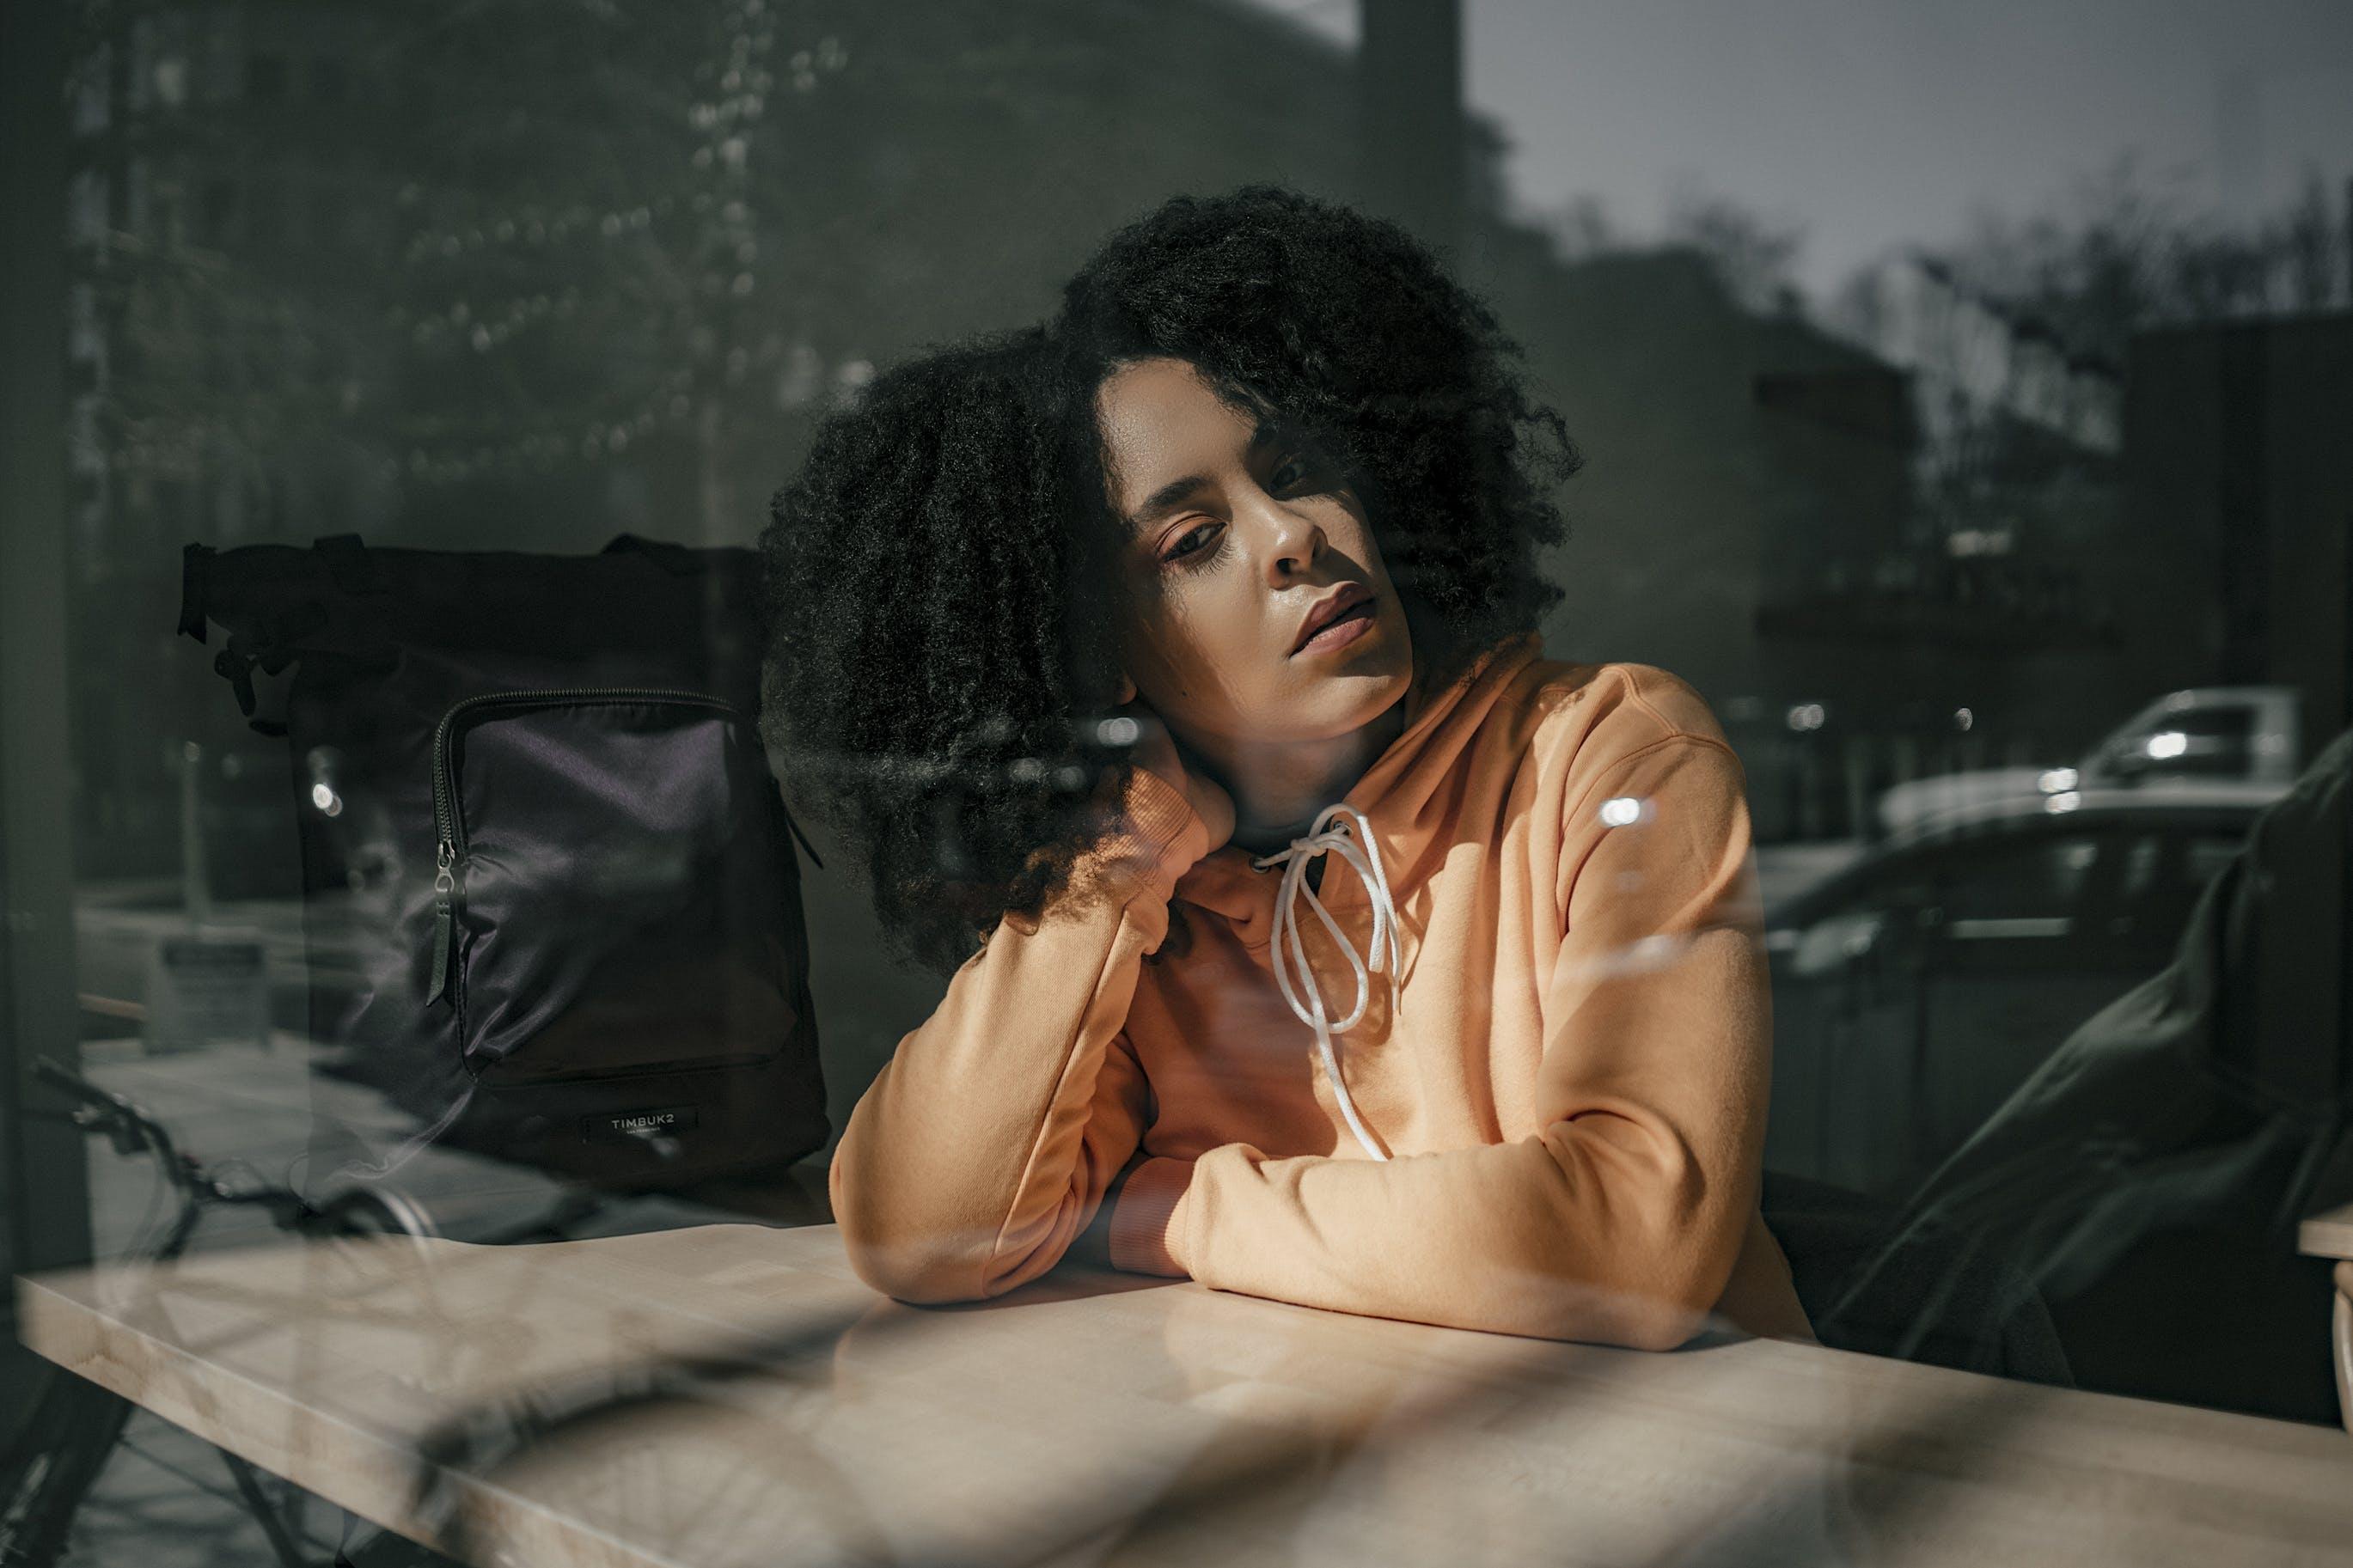 Kostenloses Stock Foto zu afroamerikaner-frau, drinnen, farbige frau, fotoshooting